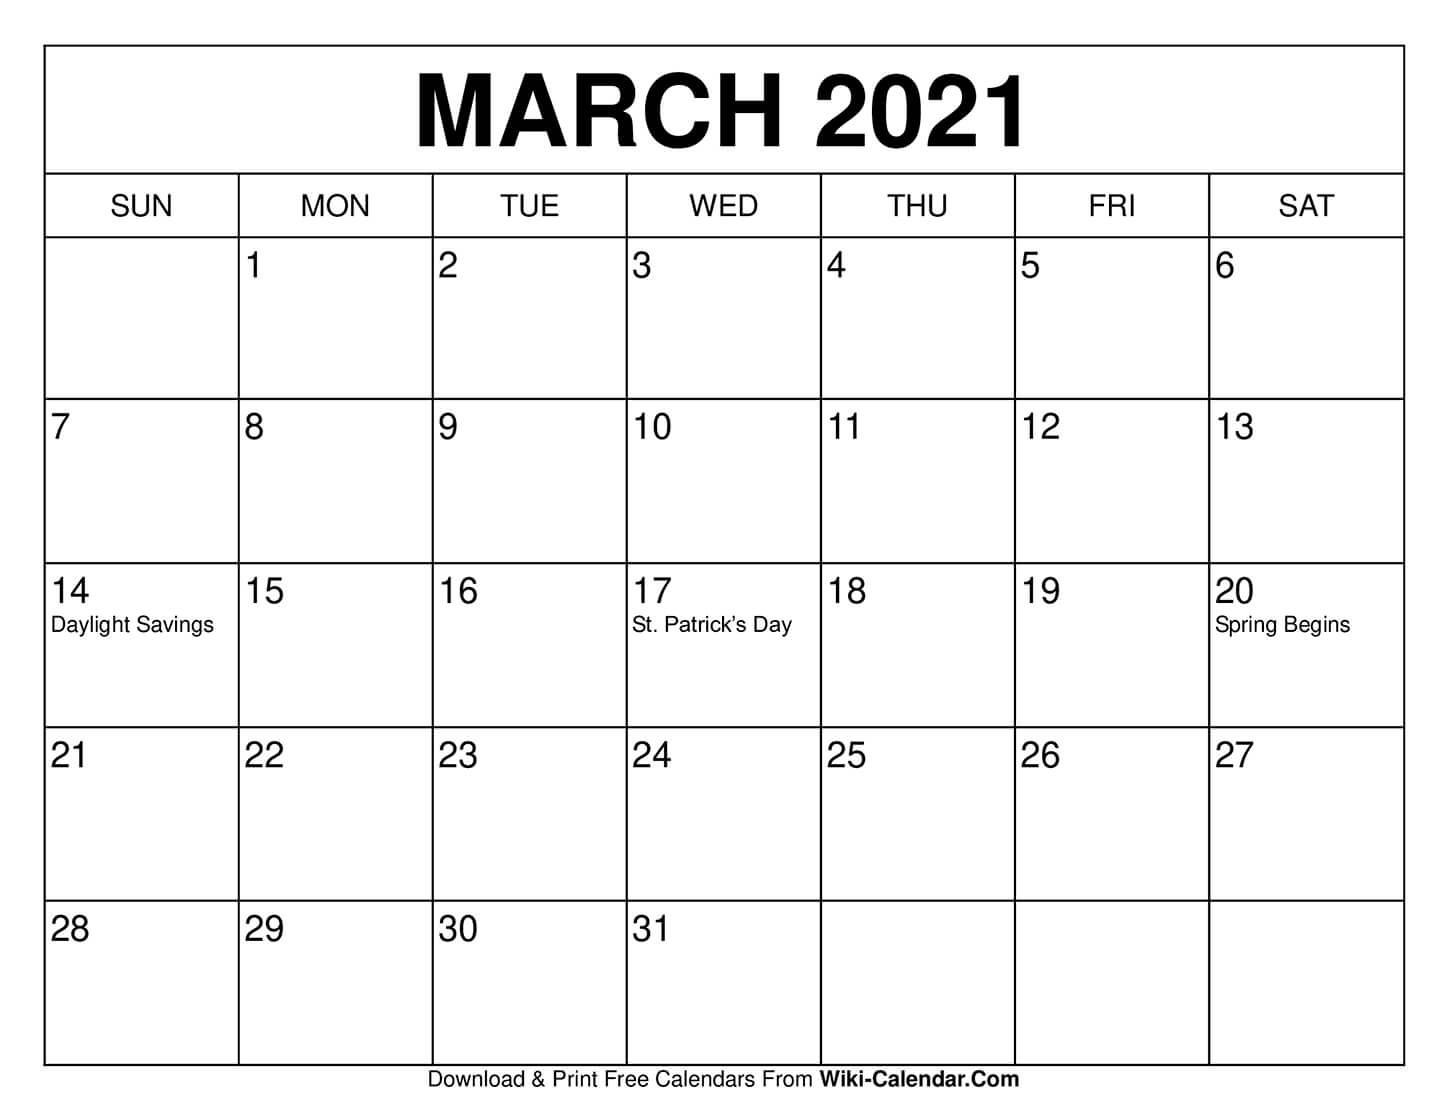 Free Printable March 2021 Calendars  Free Triple Month Calendars 2021